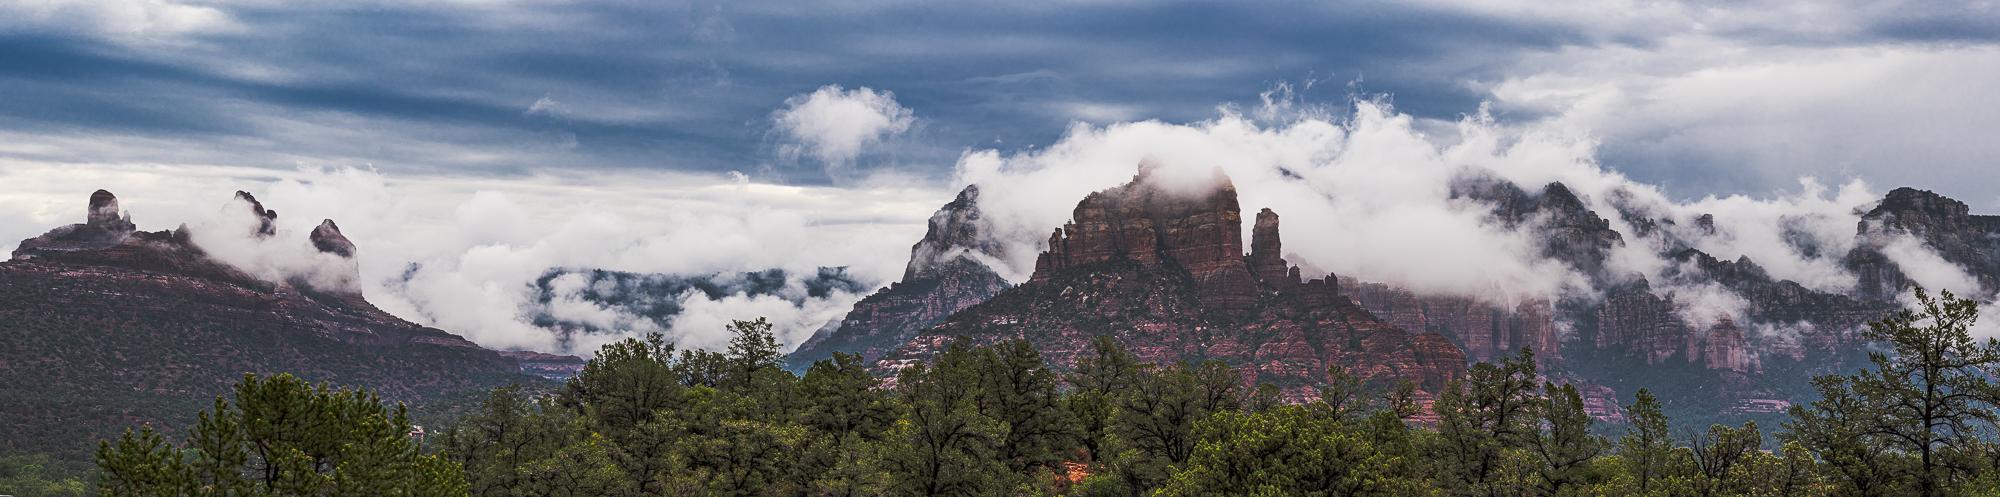 "Insert caption: ""Monsoon Clouds Over the Mogollon Rim"", 3rd edit"